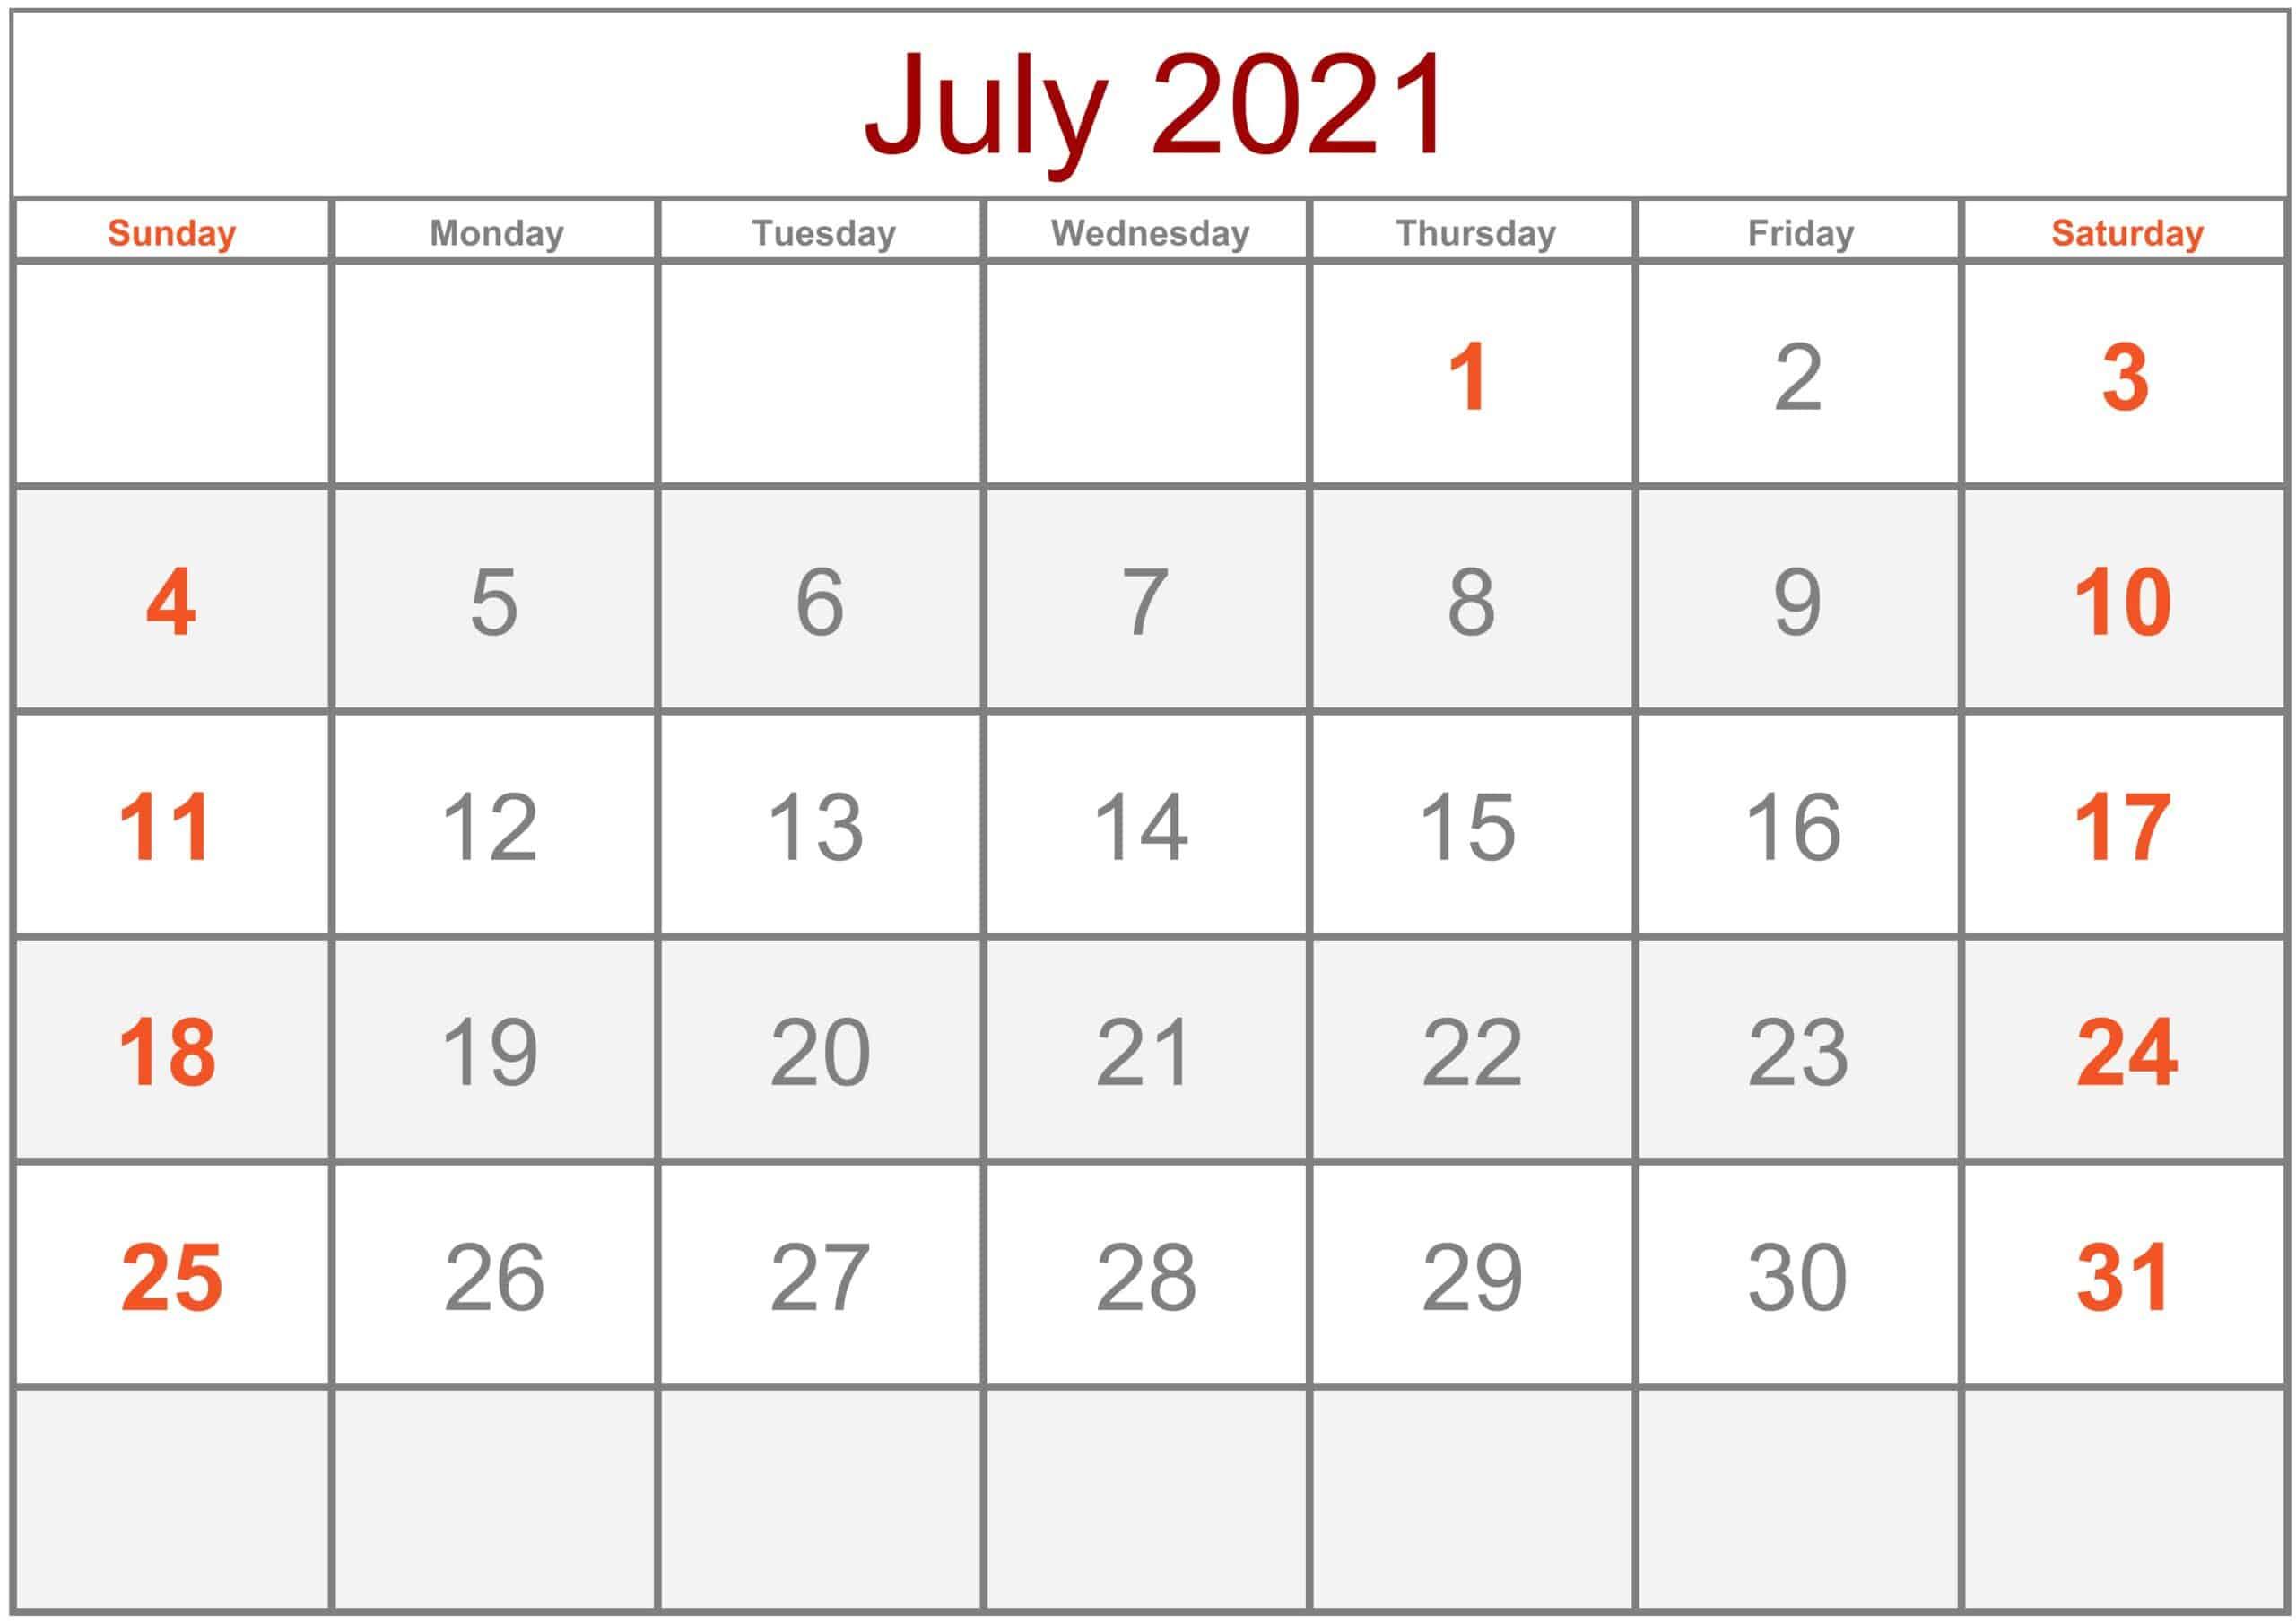 Calendar July 2021 Excel